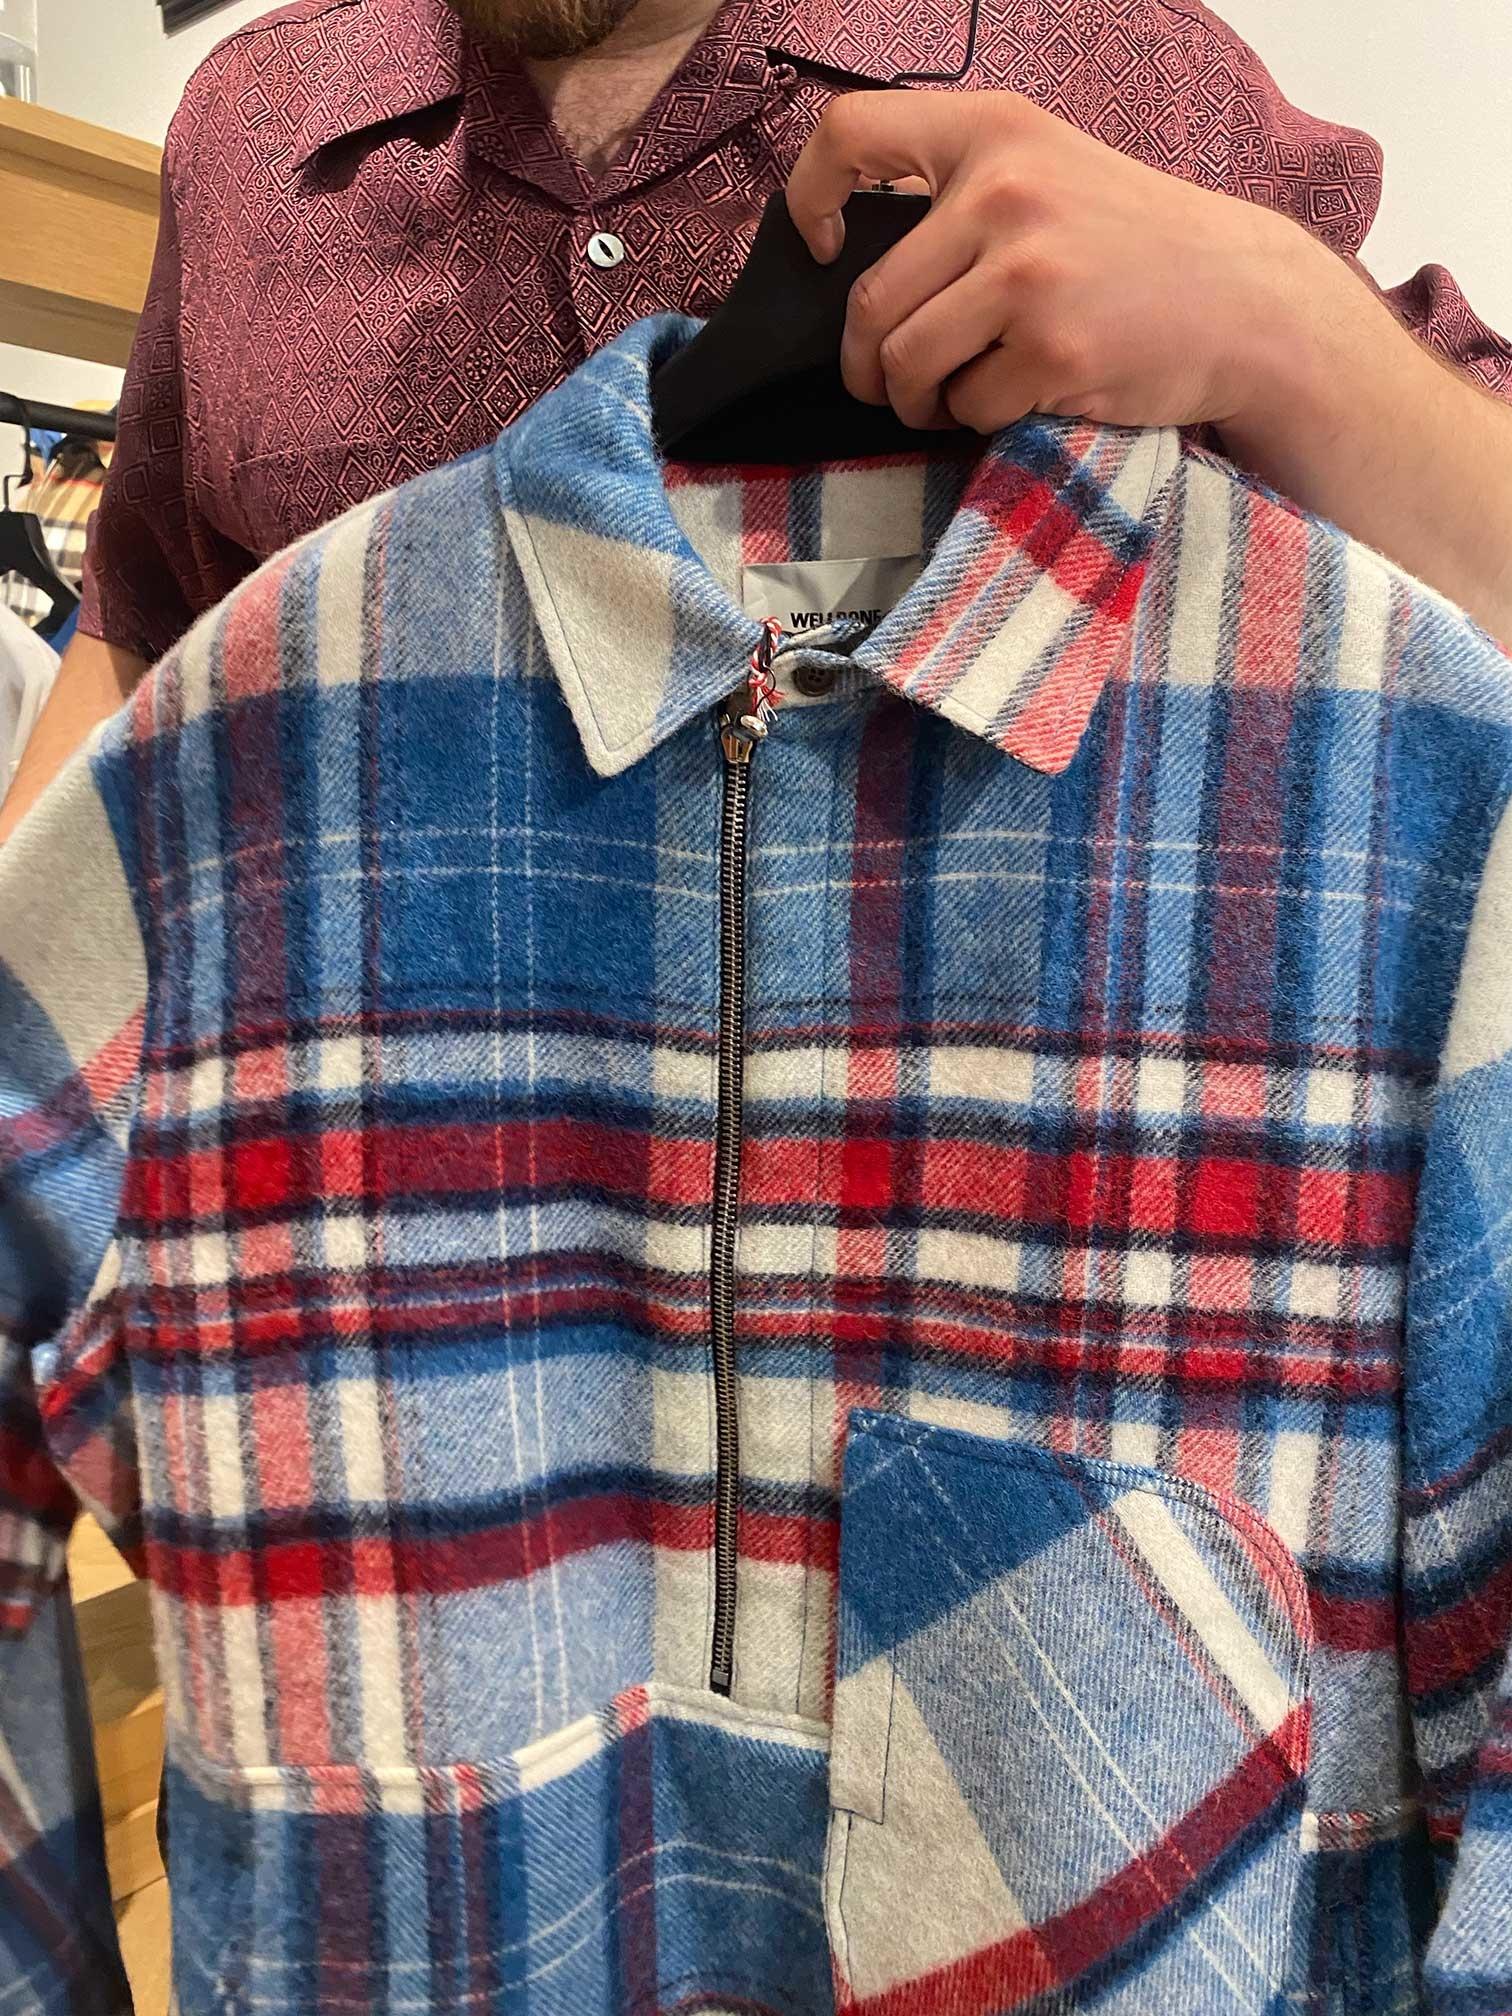 Sacha holds a WE11DONE anorak wool shirt